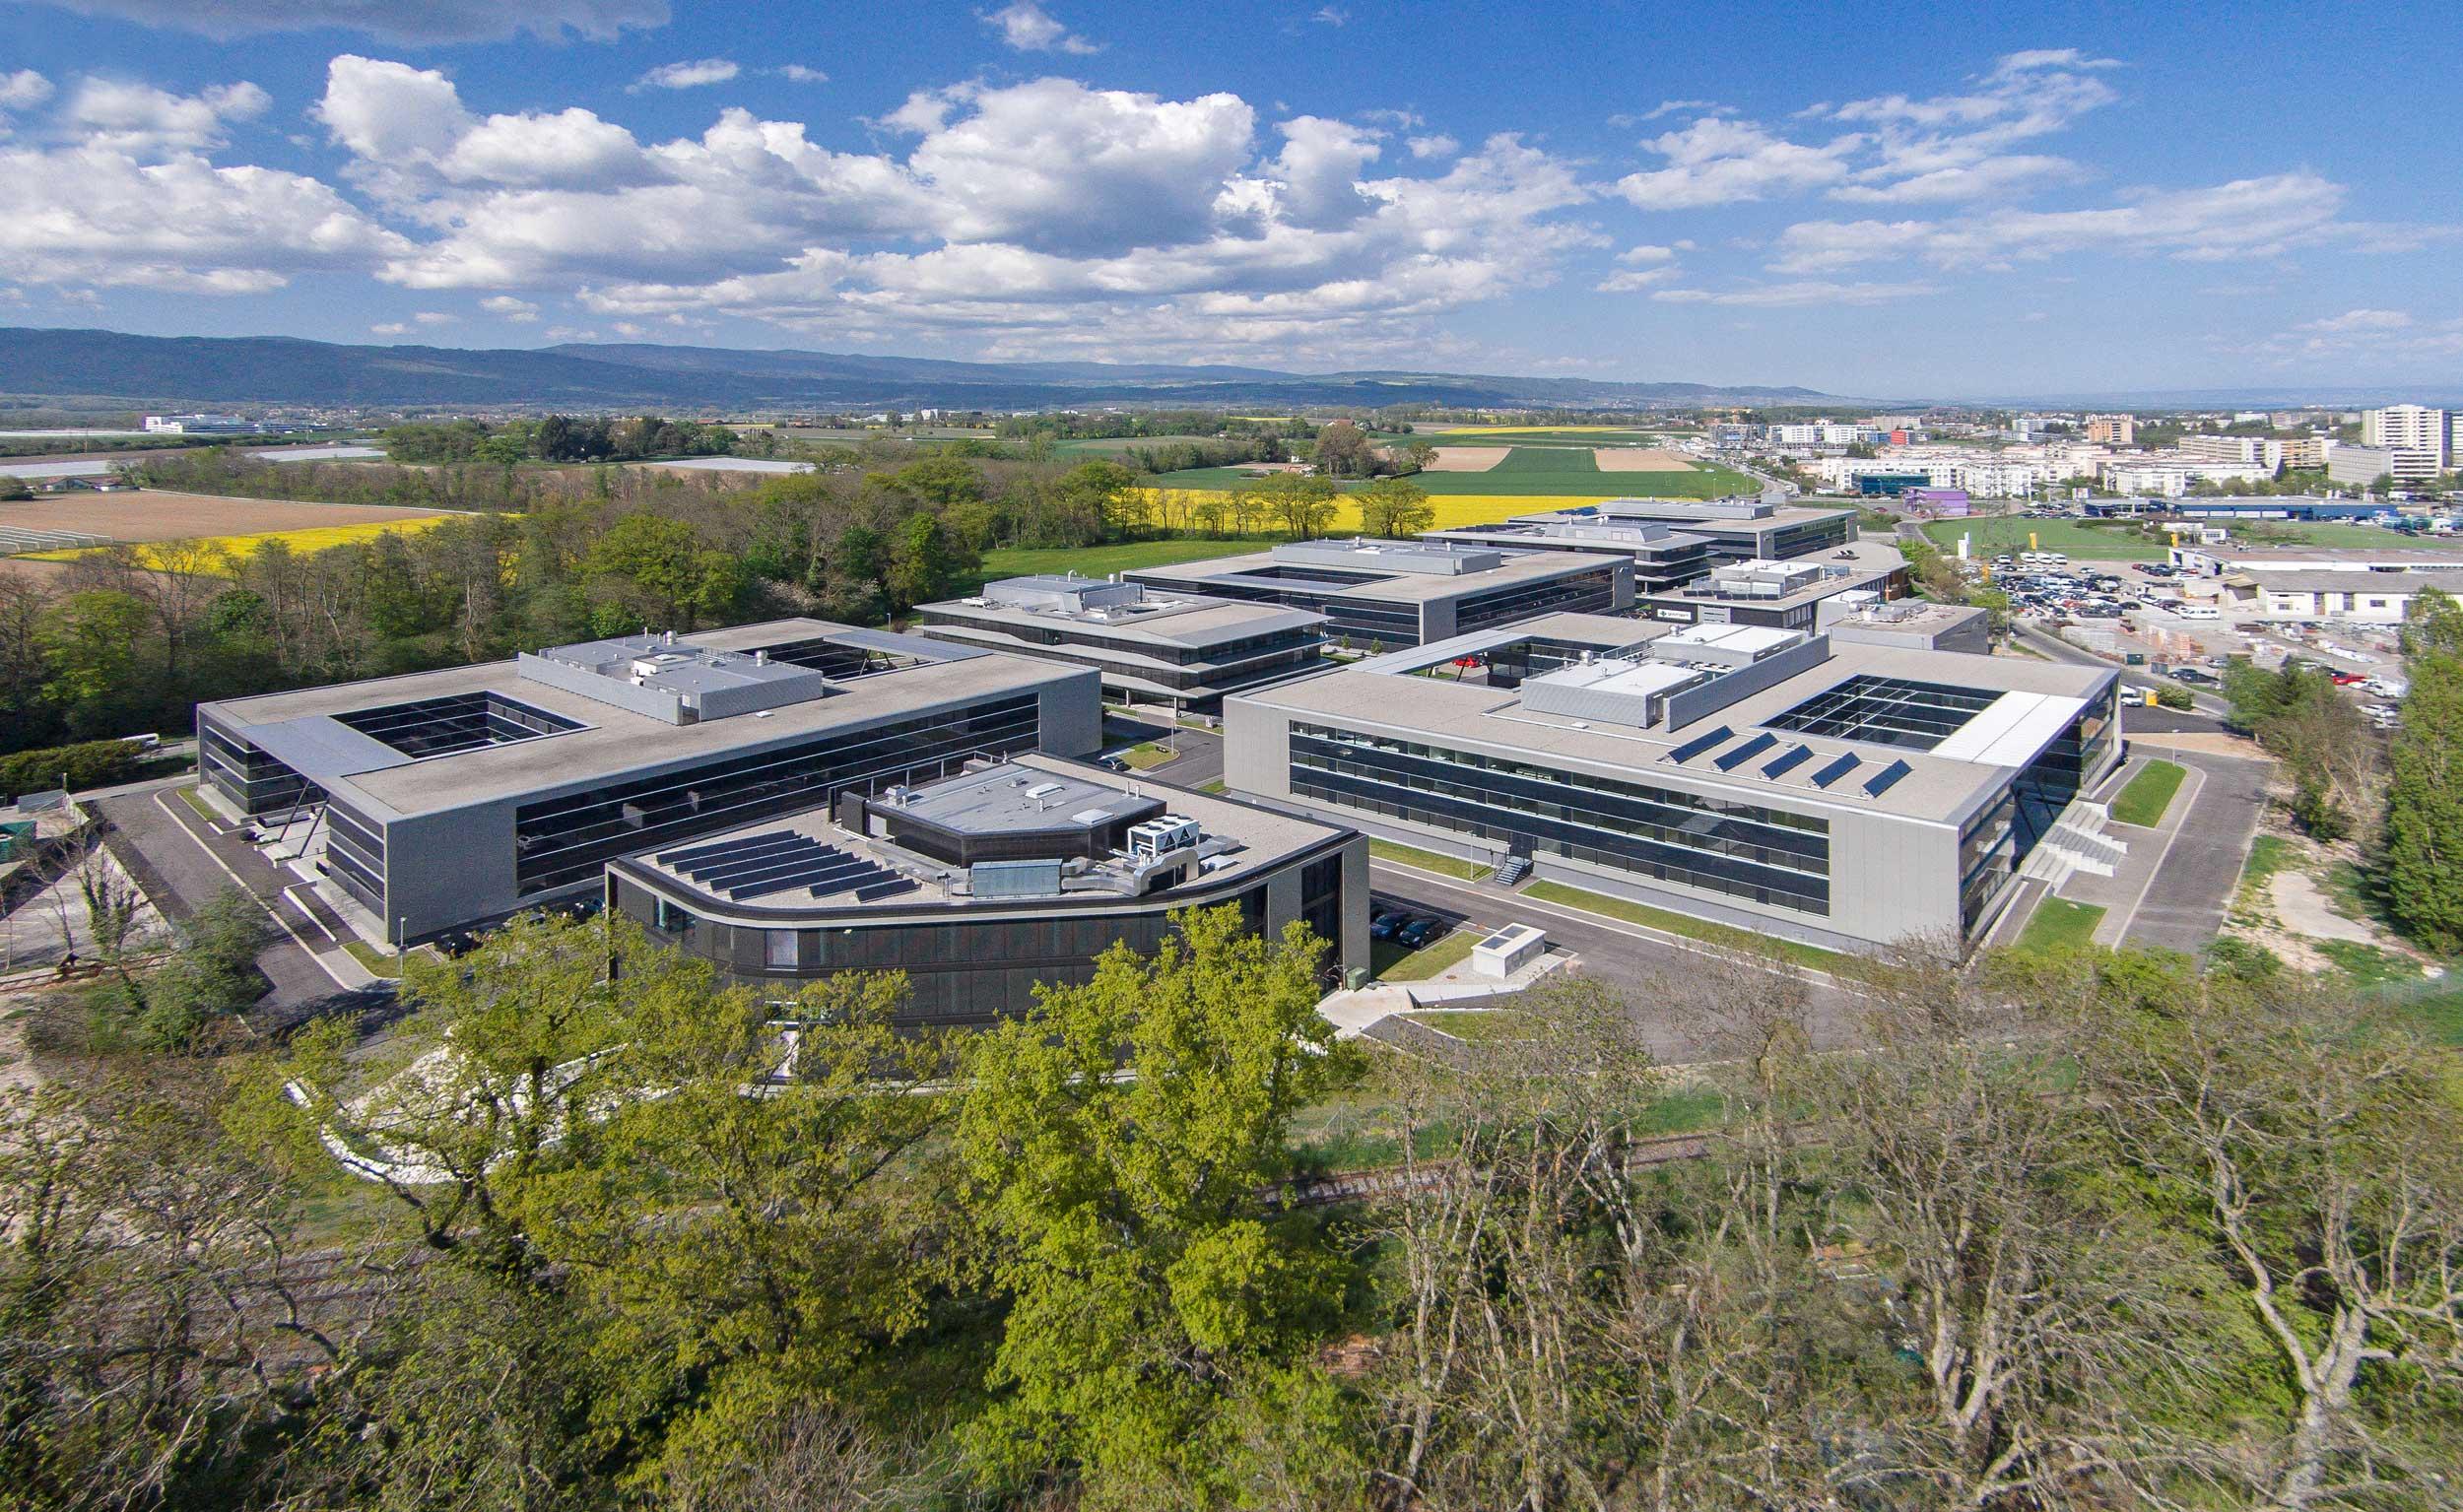 Drone fotografie van Terre Bonne Park in Zwitserland - Architectuurfotograaf Chiel de Nooyer